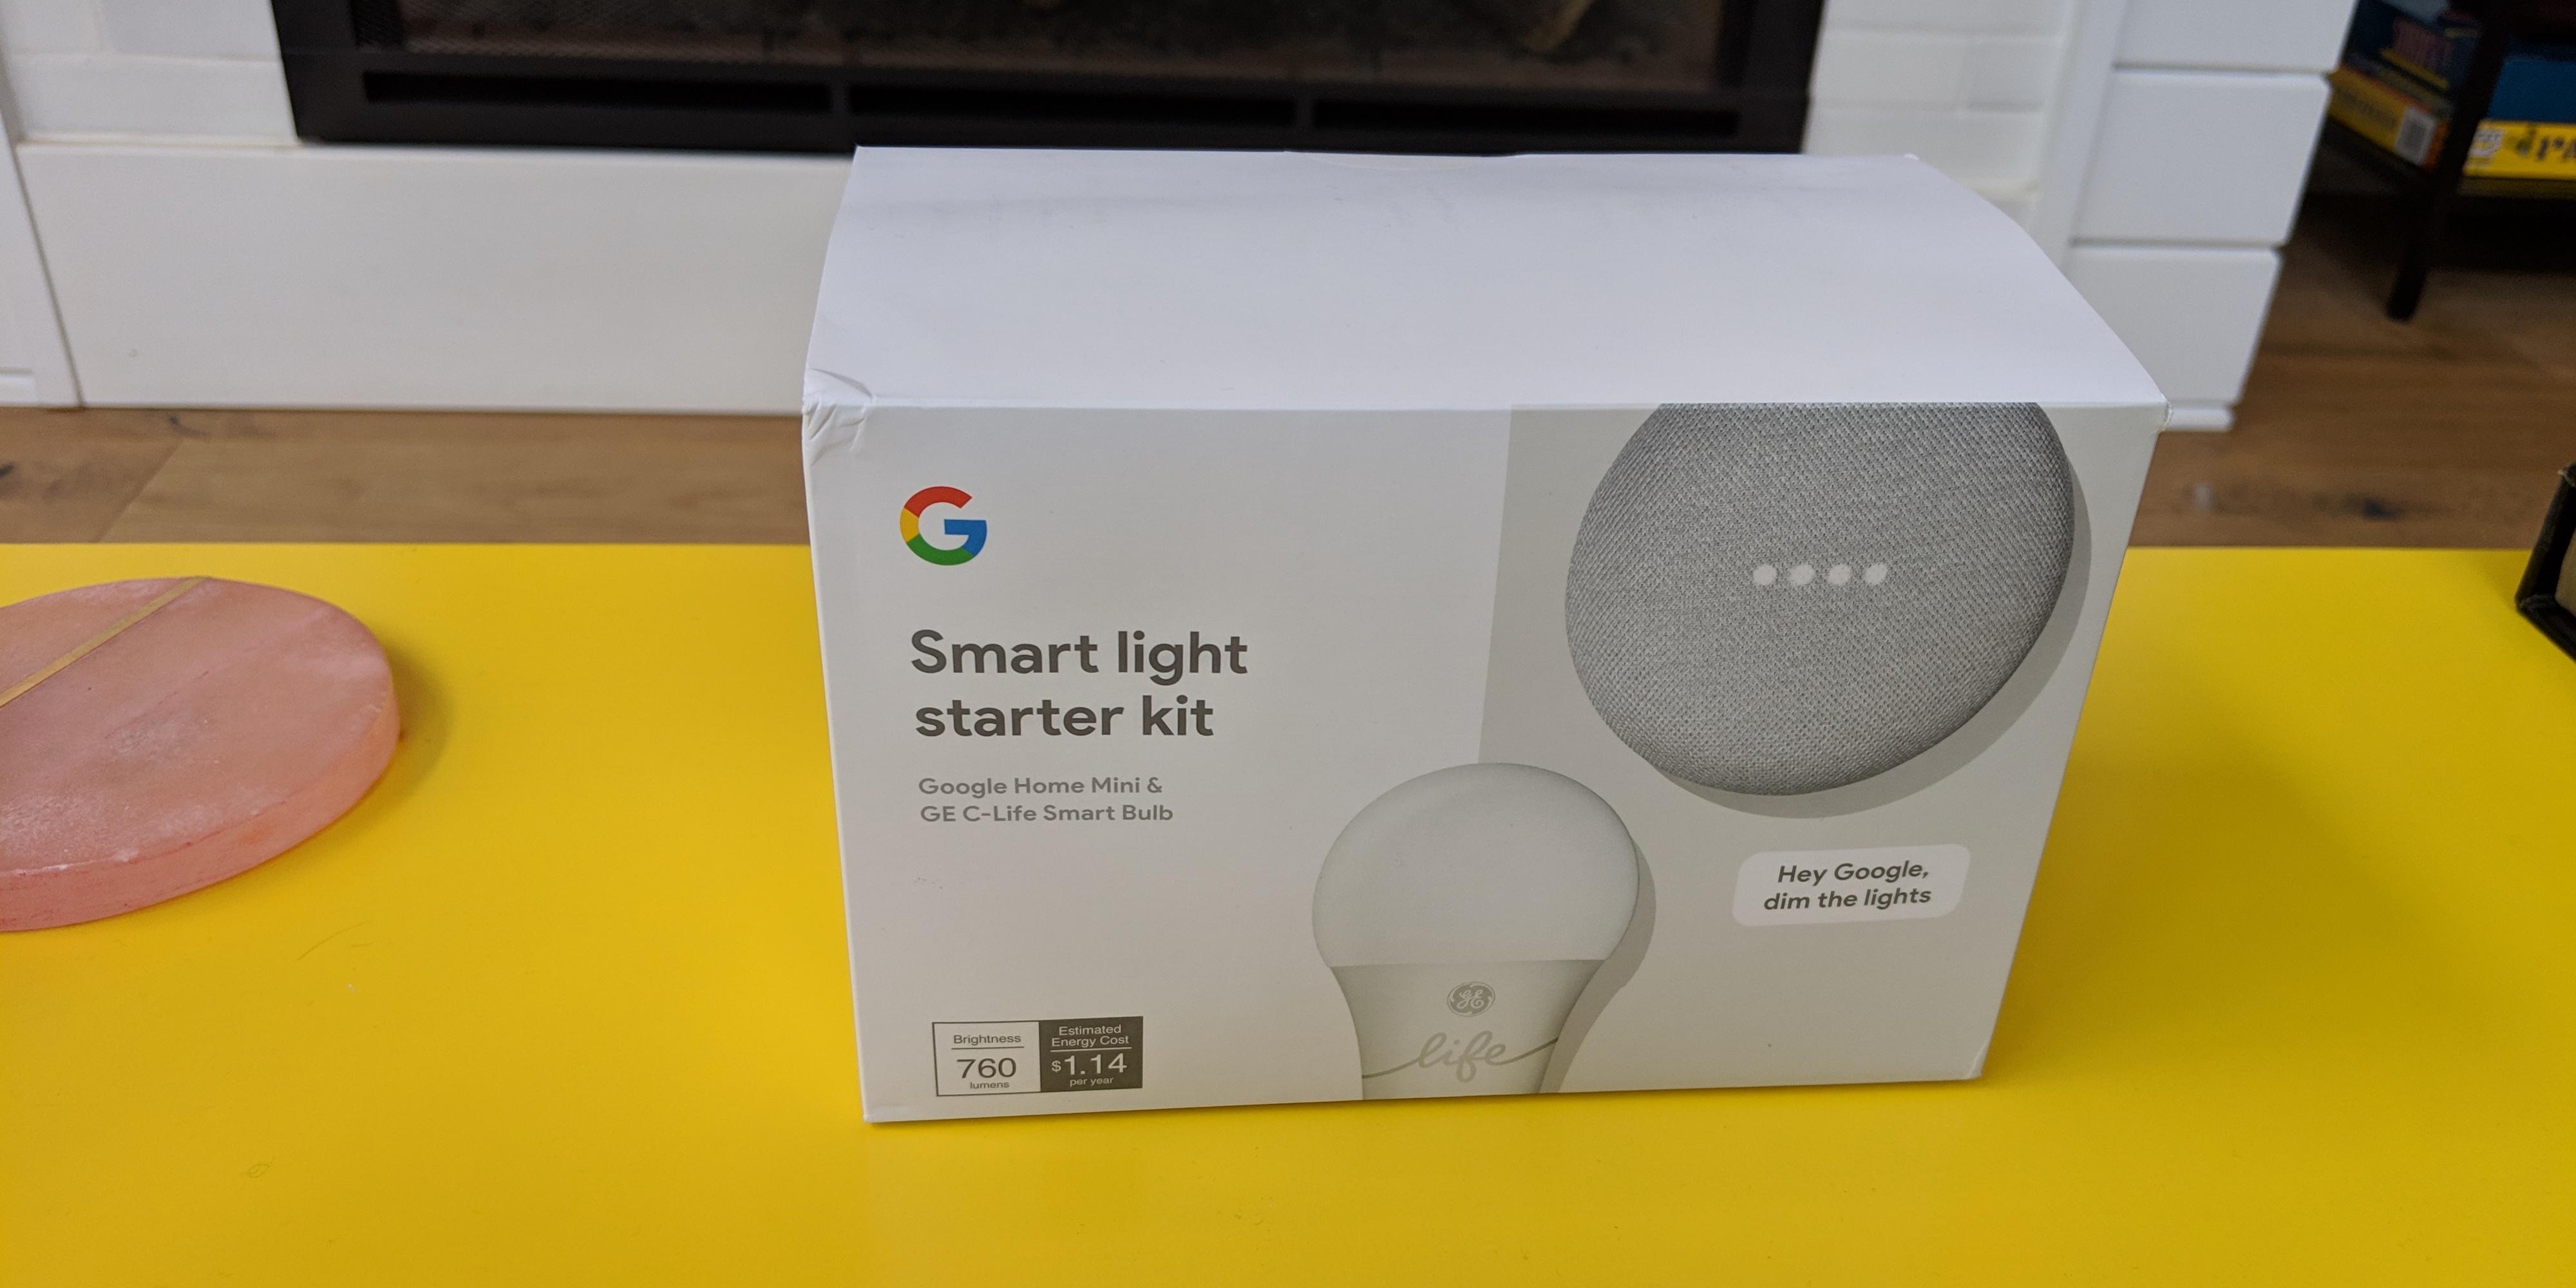 Google Home Mini bundle